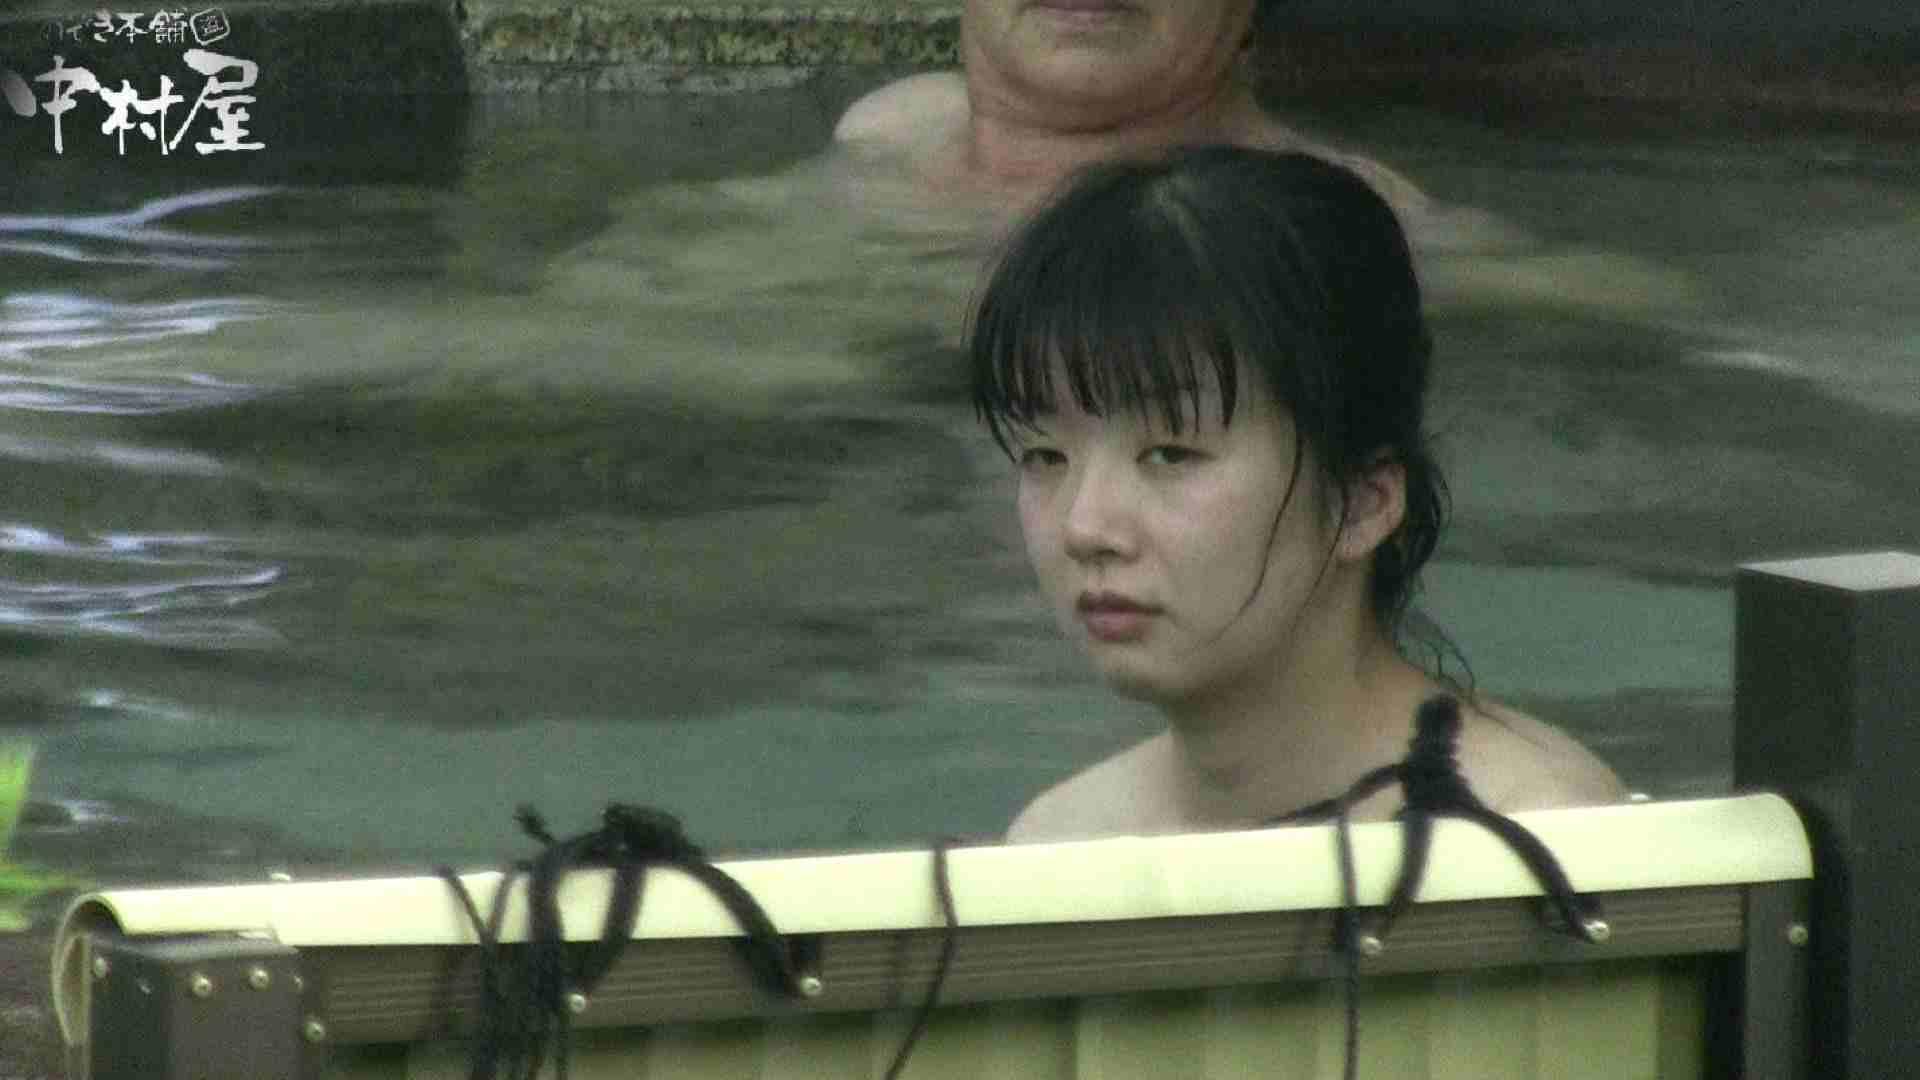 Aquaな露天風呂Vol.904 盗撮師作品 | 露天風呂突入  103pic 25